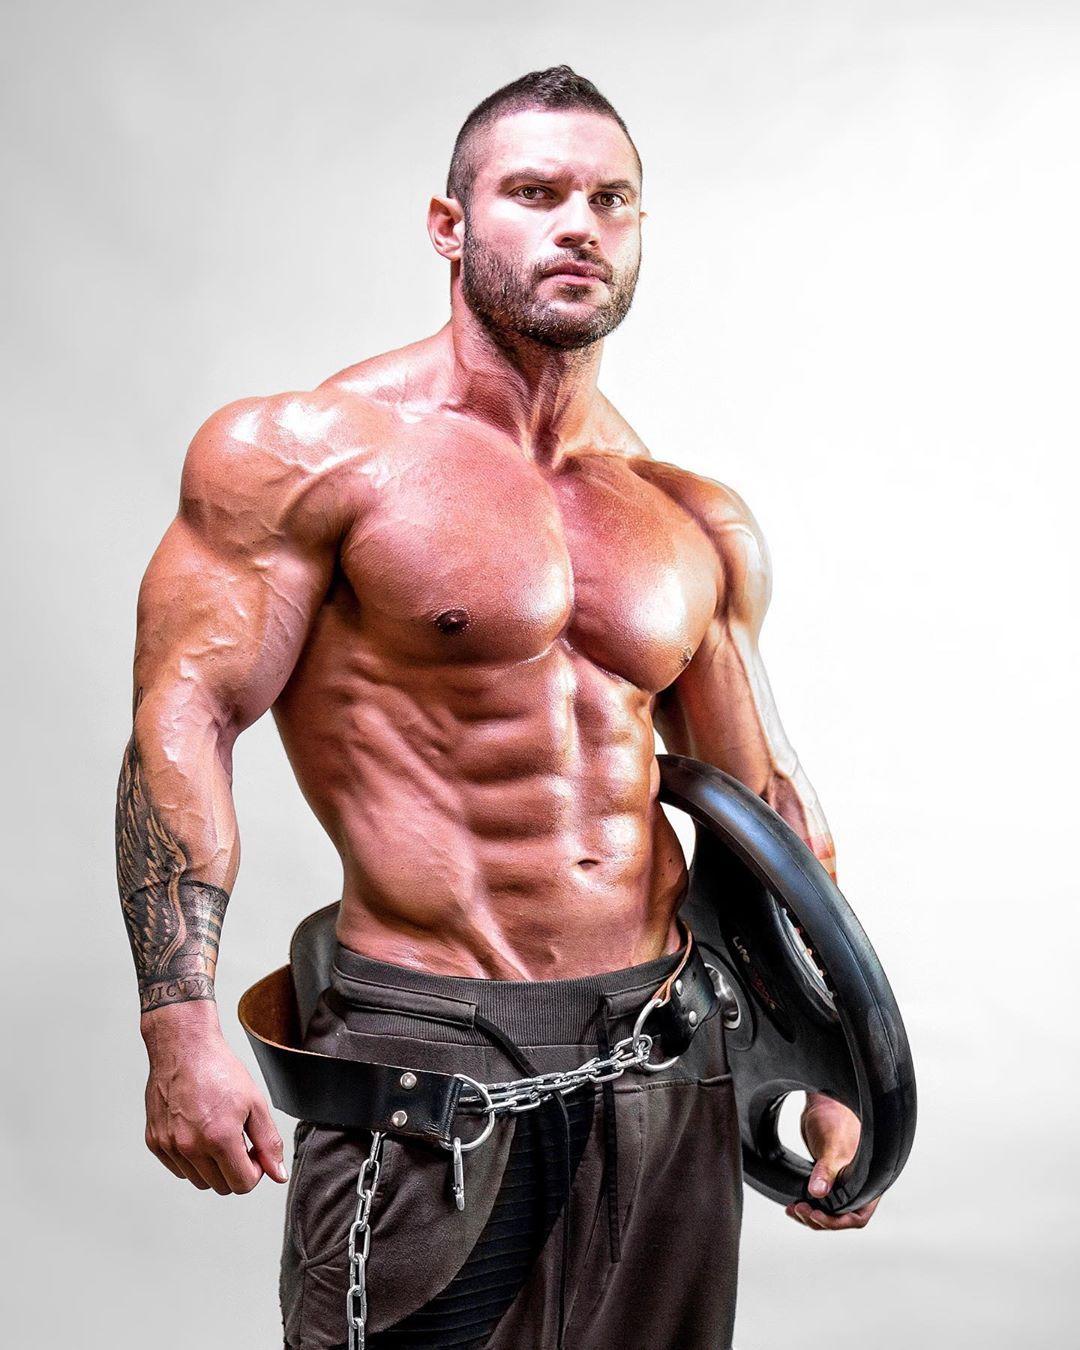 Pin By Douglas Chew On Boys Boys Boys Gym Body Best Physique